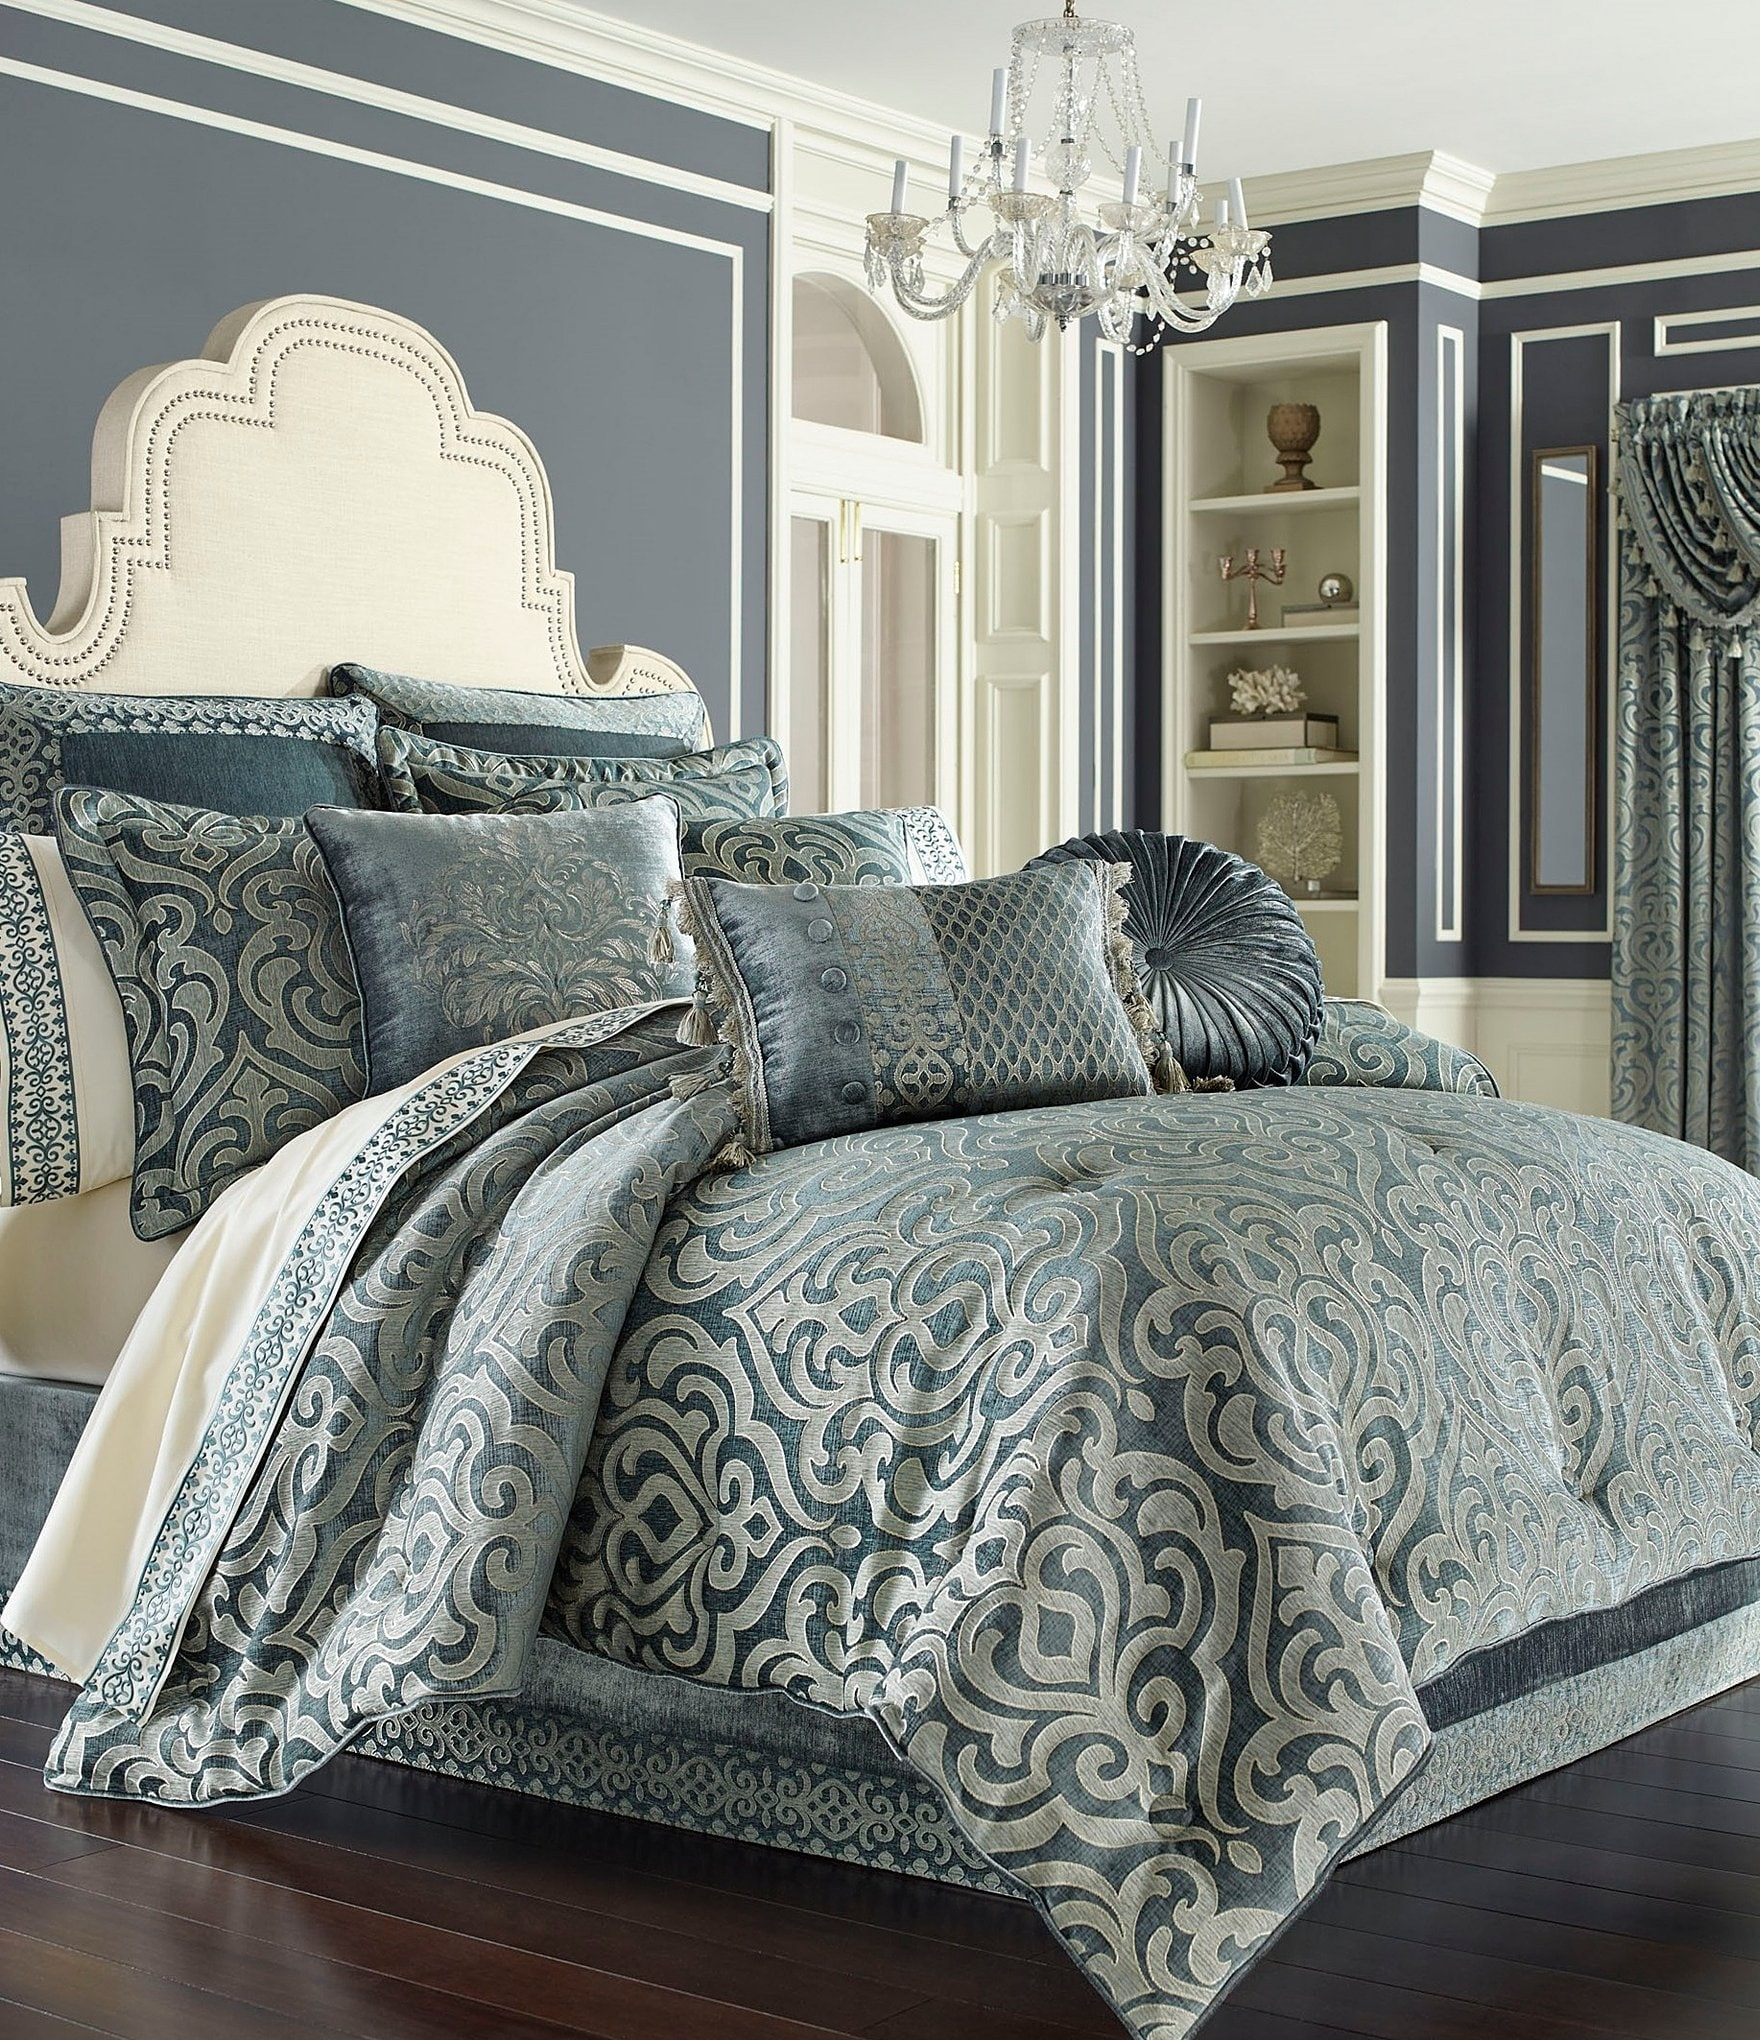 J Queen New York Sicily Puffed Damask Comforter Set